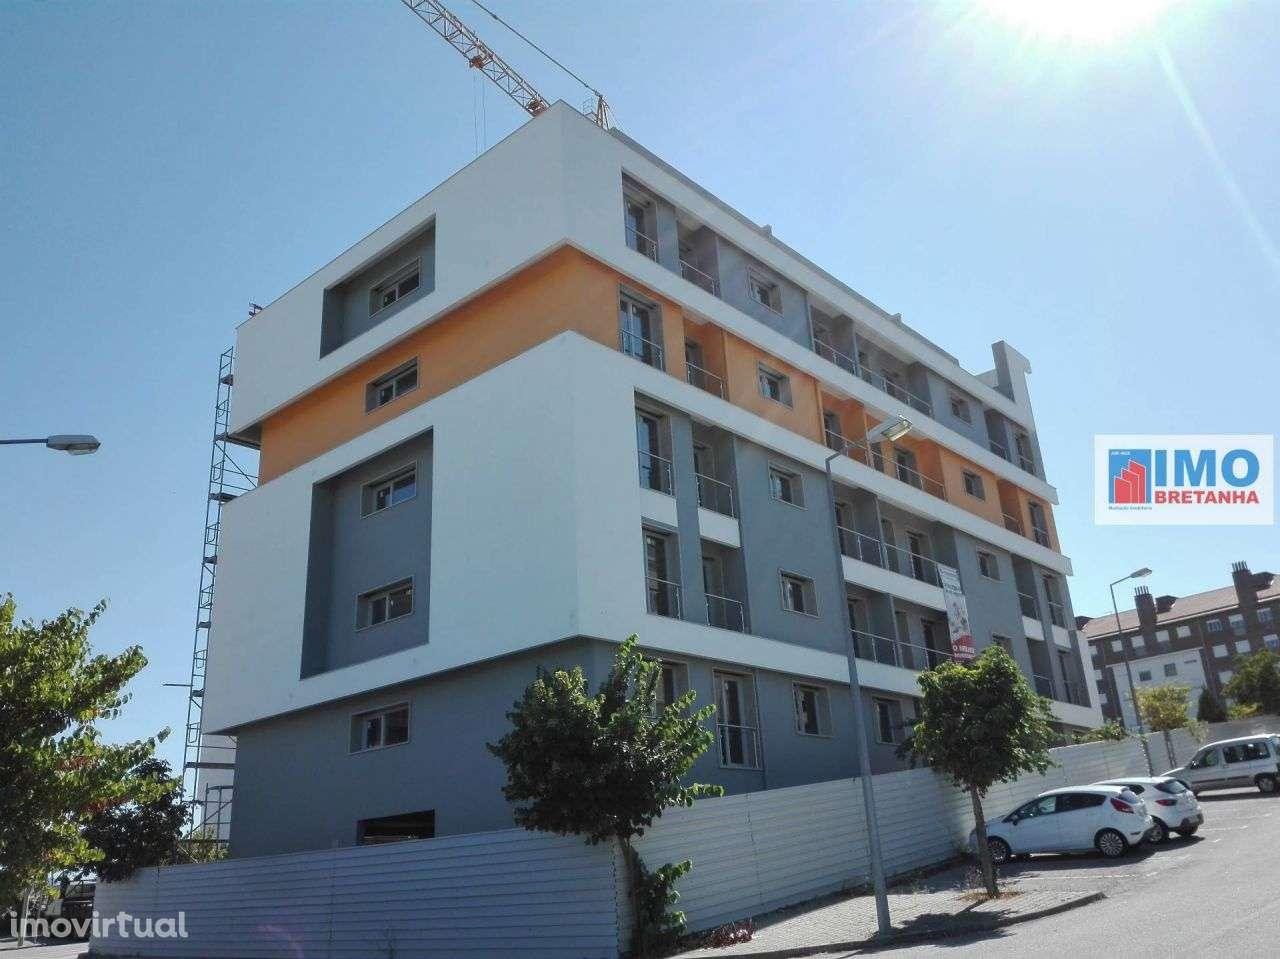 Apartamento para comprar, Covilhã e Canhoso, Covilhã, Castelo Branco - Foto 2